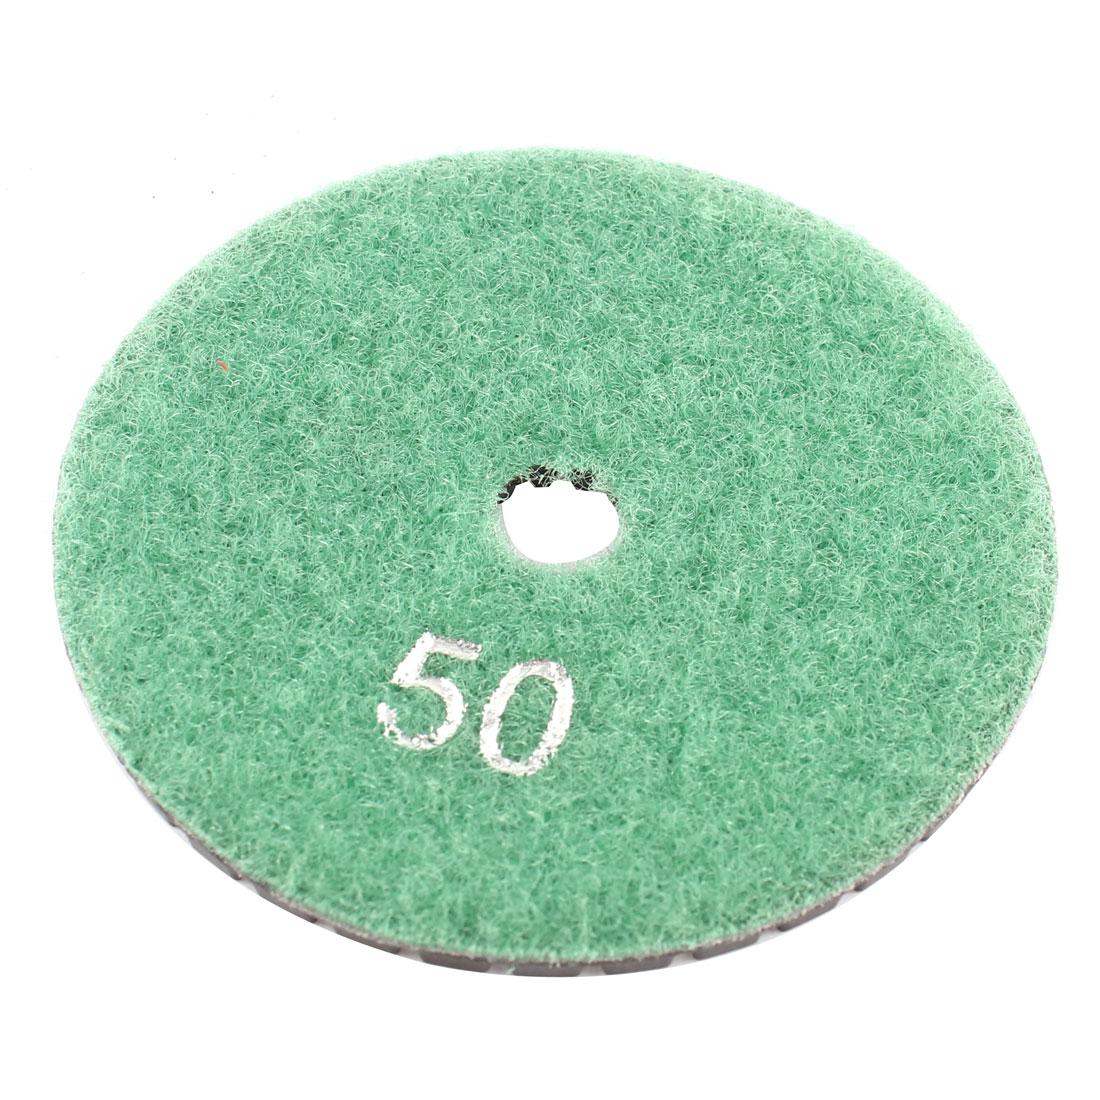 "Wet Dry Granite Concrete Marble Grinder Diamond Polishing Pad 3"" Green Black"